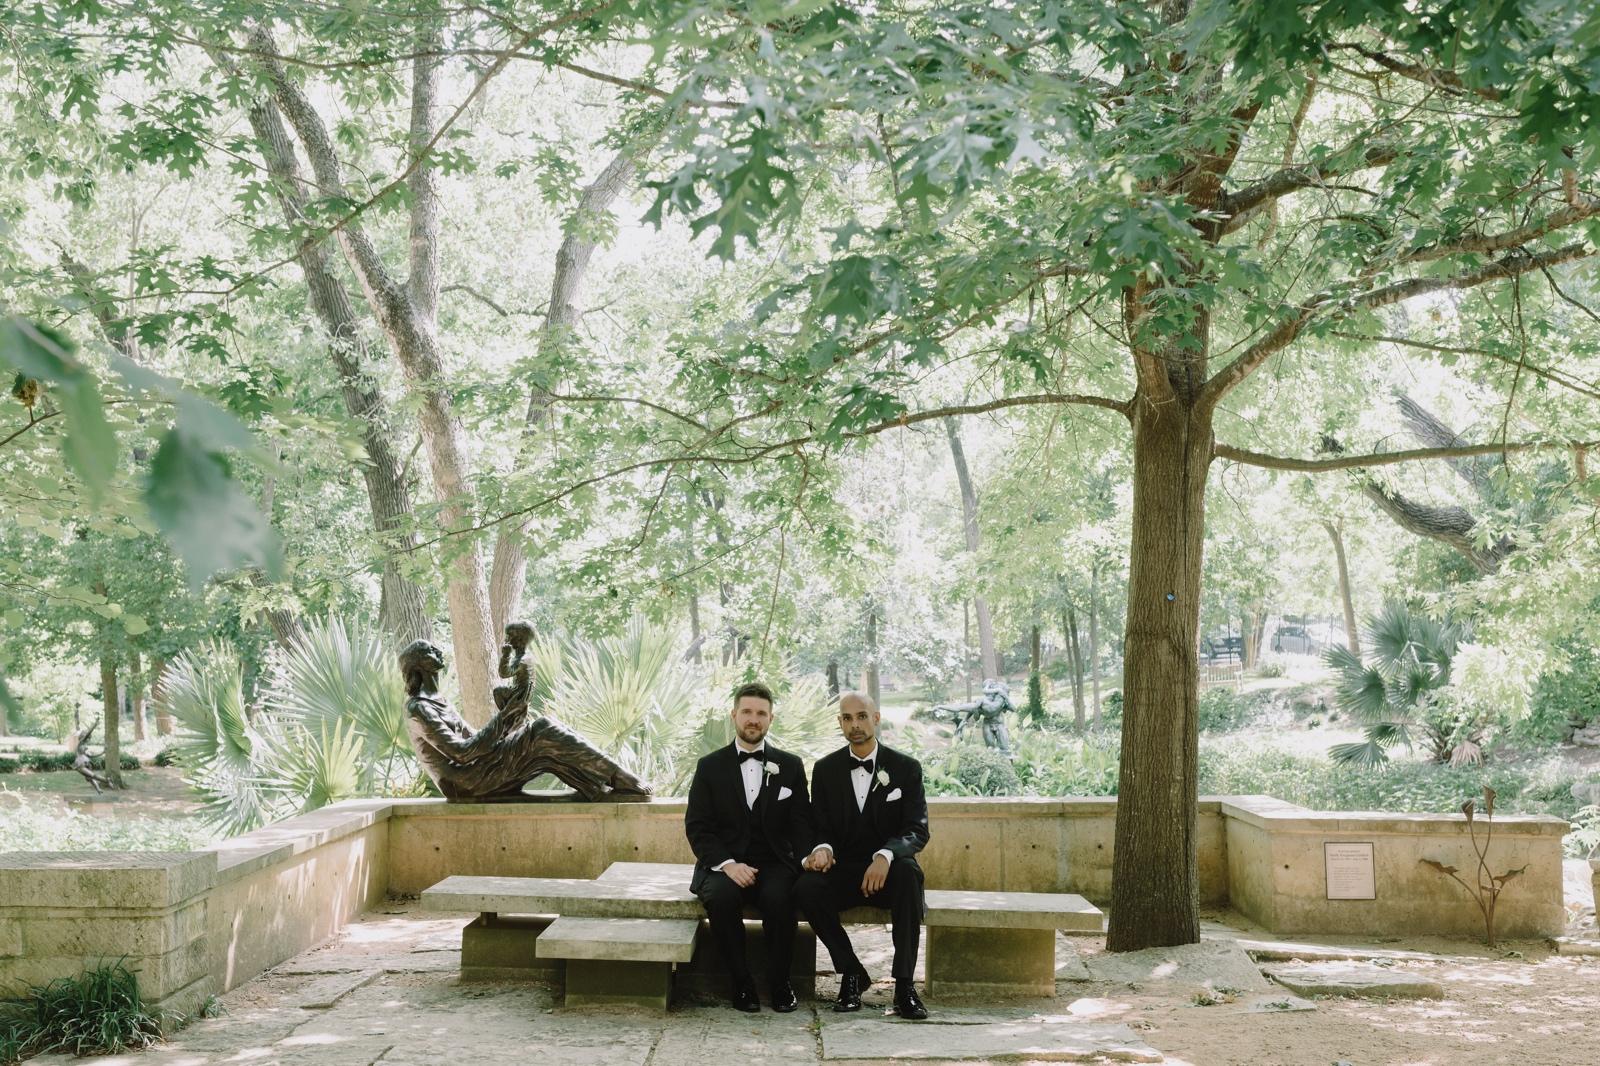 Creative wedding portraits in the Umlauf Sculpture Garden for two grooms